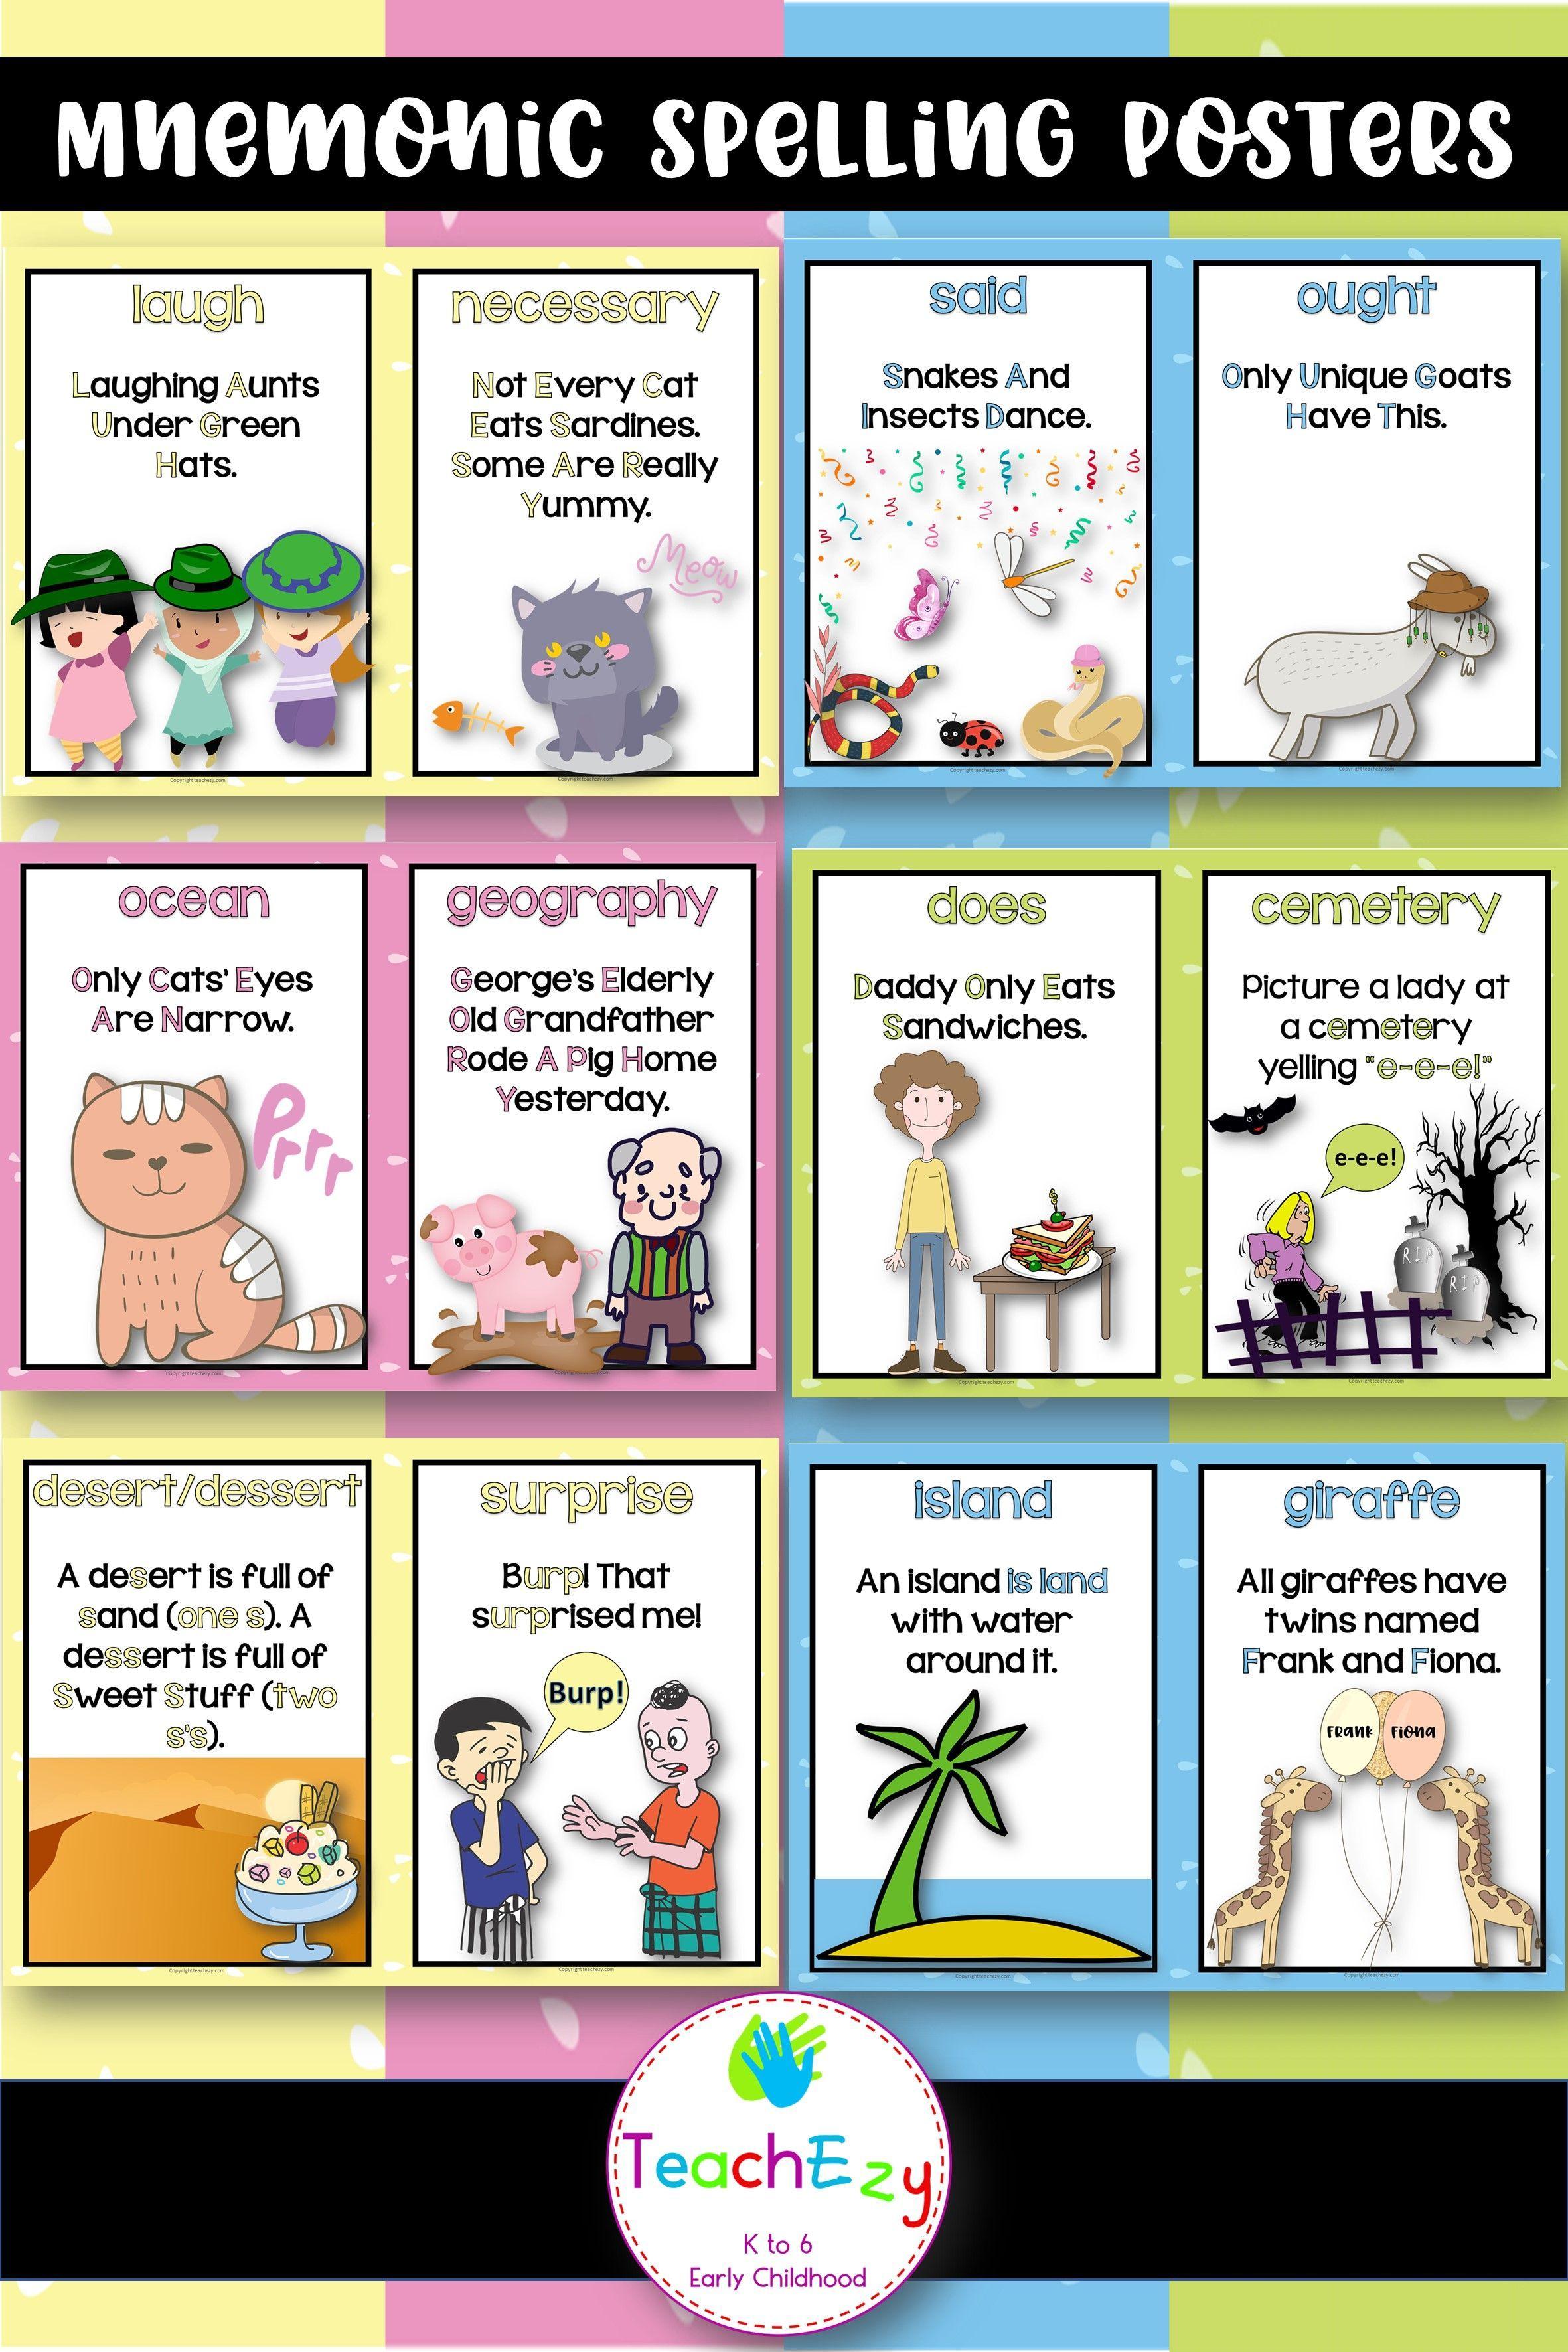 Mnemonic Spelling Posters Teachezy Tricky Words Mnemonics Spelling [ 3543 x 2362 Pixel ]